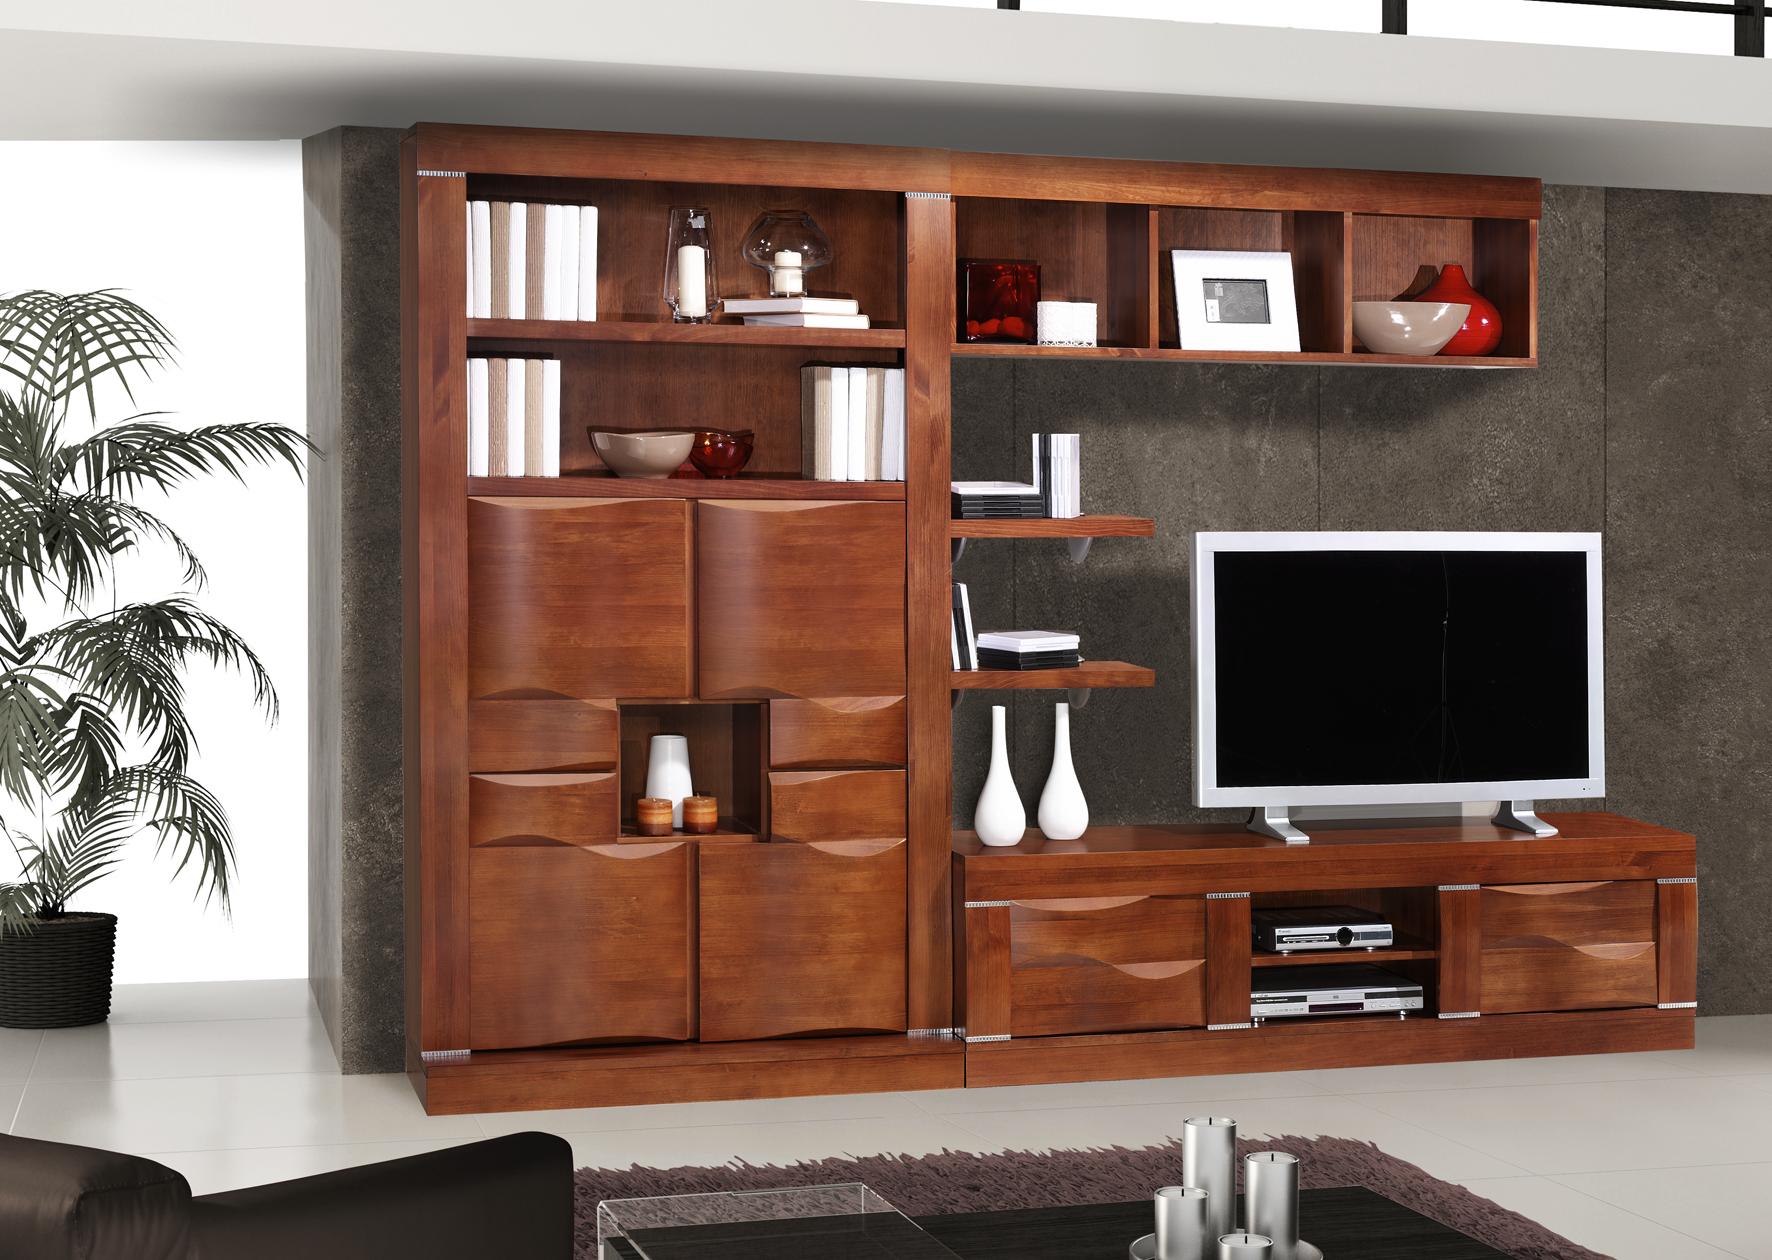 Muebles gaudi manzanillo colecci n de ideas interesantes - Muebles online madrid ...